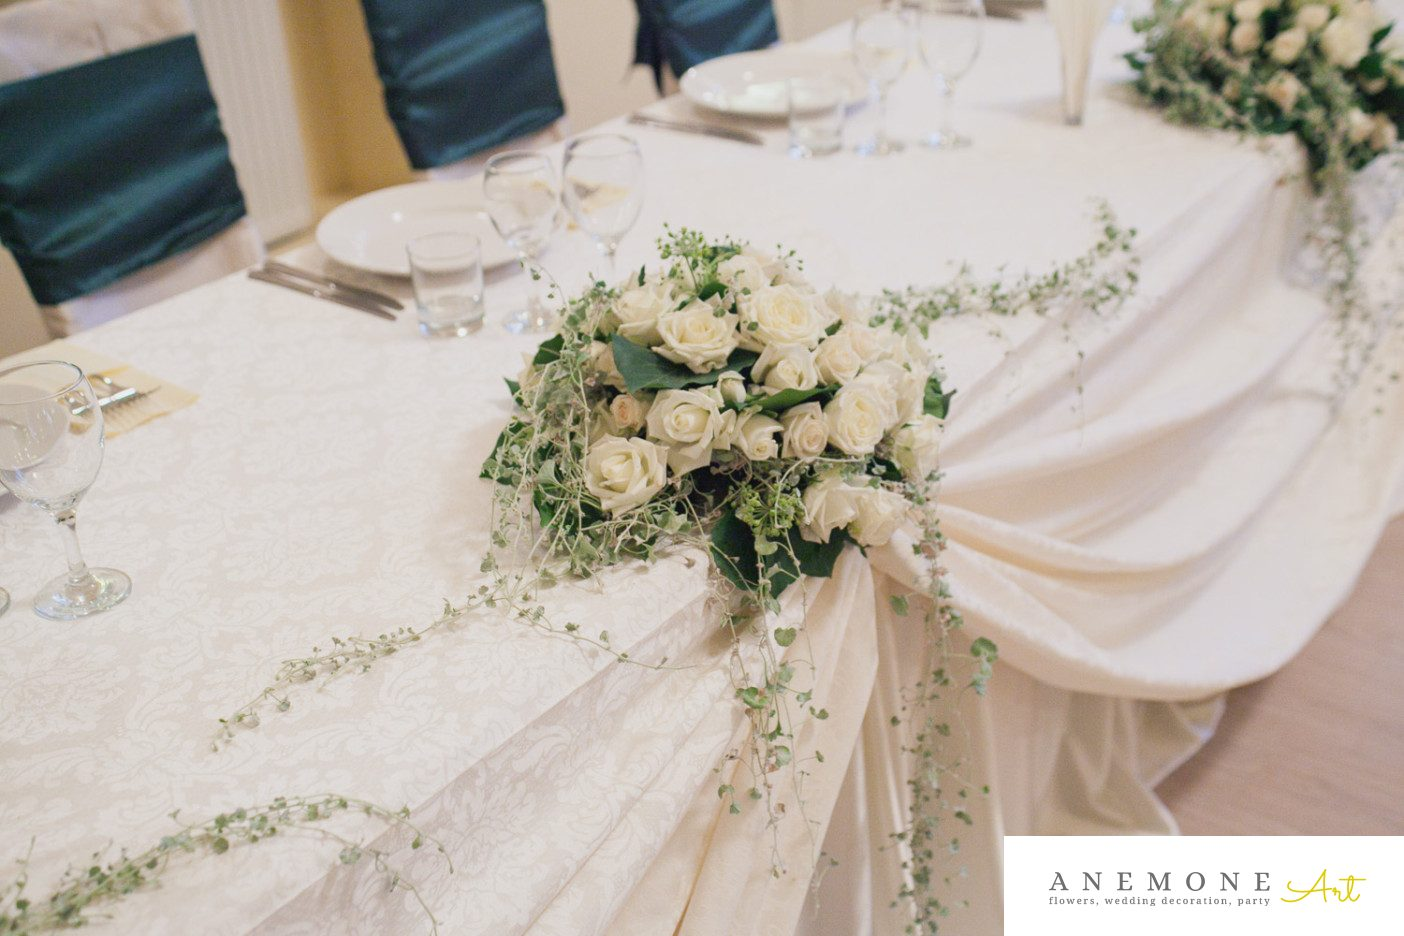 Poza, foto cu Flori de nunta alb, decor masa, prezidiu, trandafiri in Arad, Timisoara, Oradea (wedding flowers, bouquets) nunta Arad, Timisoara, Oradea